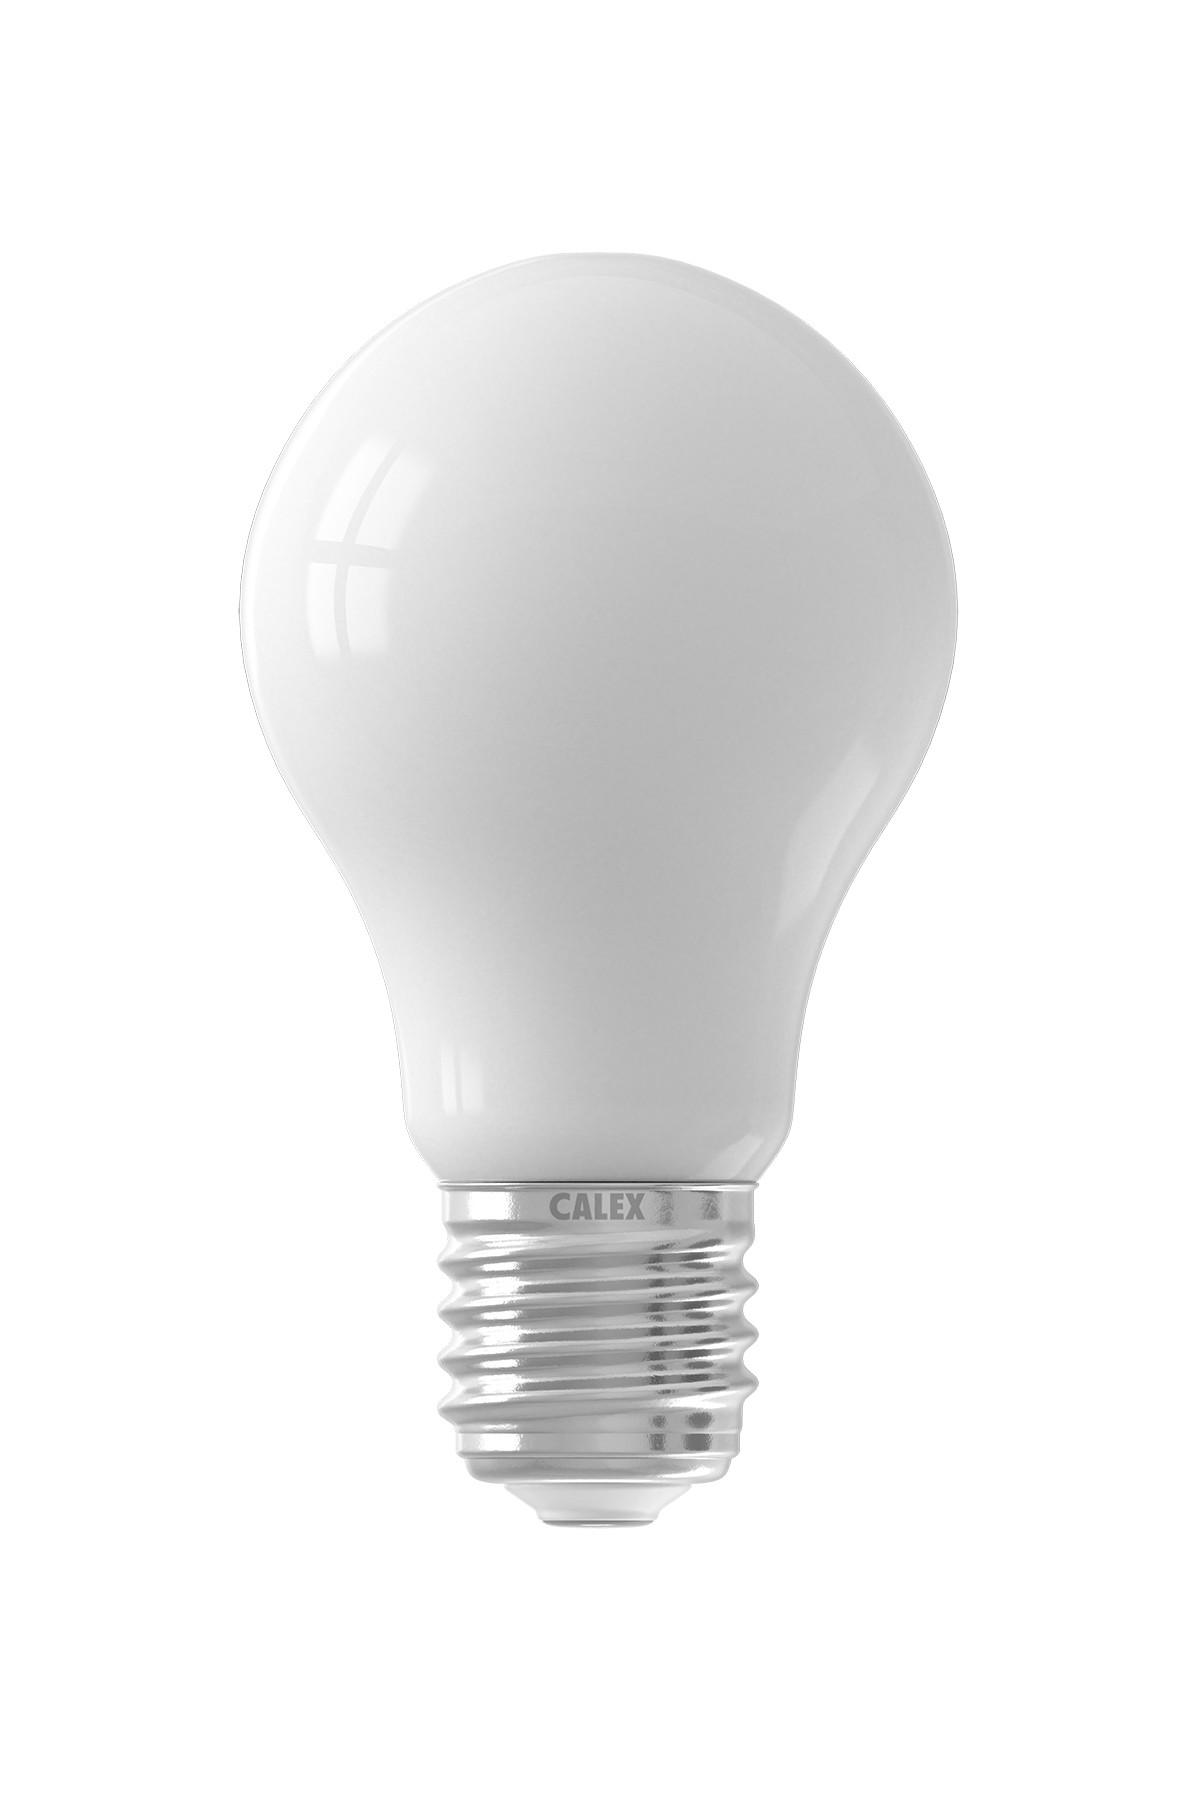 Calex LED volglas Filament Standaardlamp 240V 8W 1000lm E27 A67, Softline 2700K CRI80 dimbaar